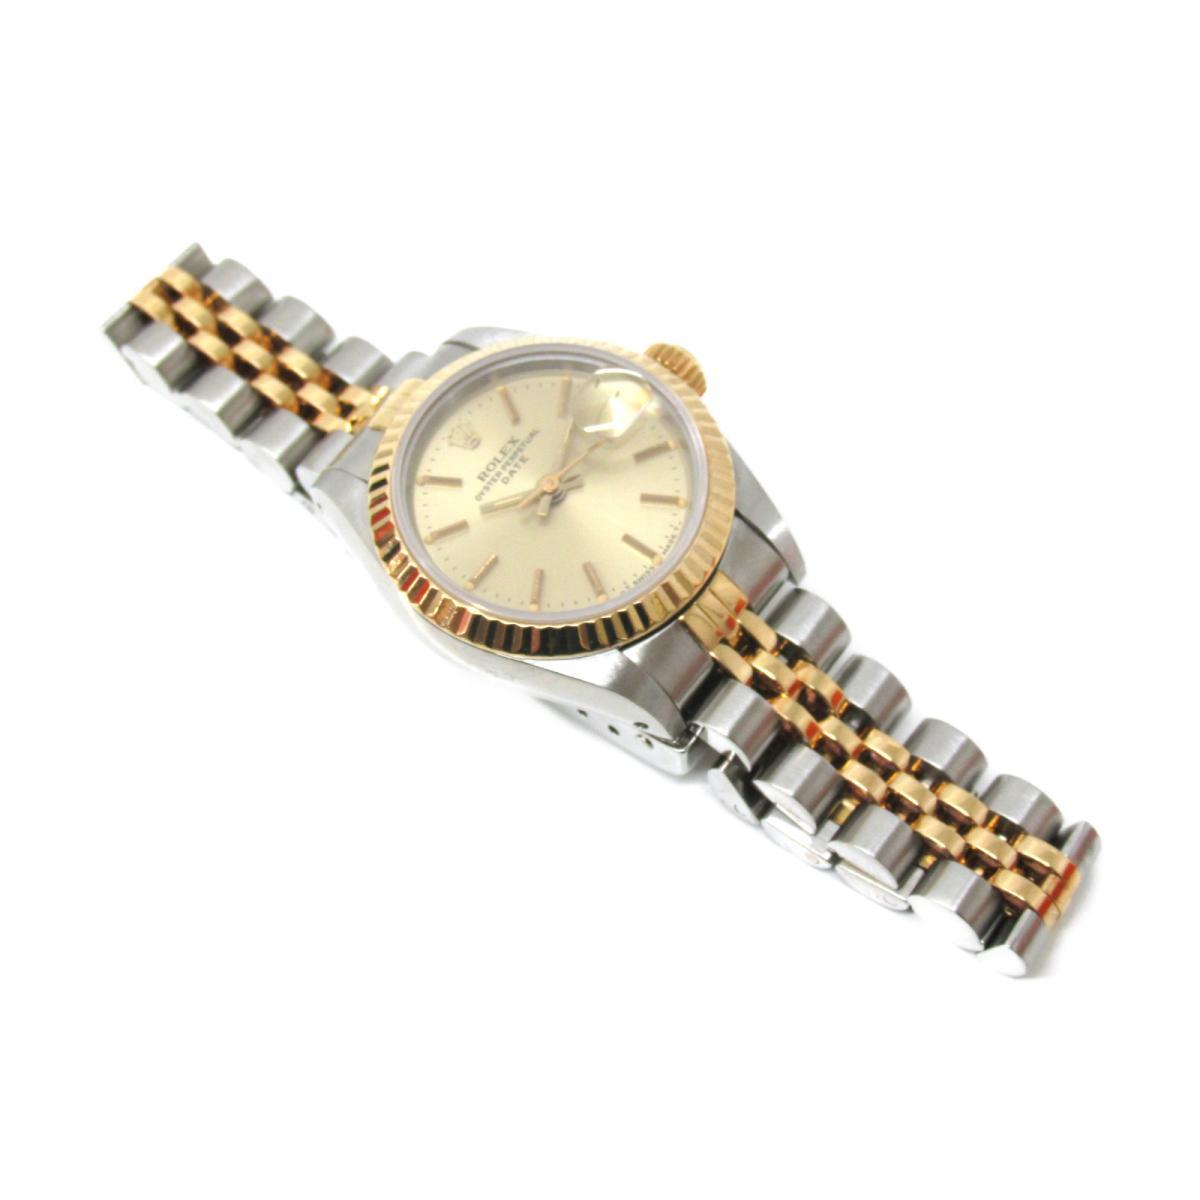 ROLEX 時計 69173 デイトジャスト 腕時計 /レディース